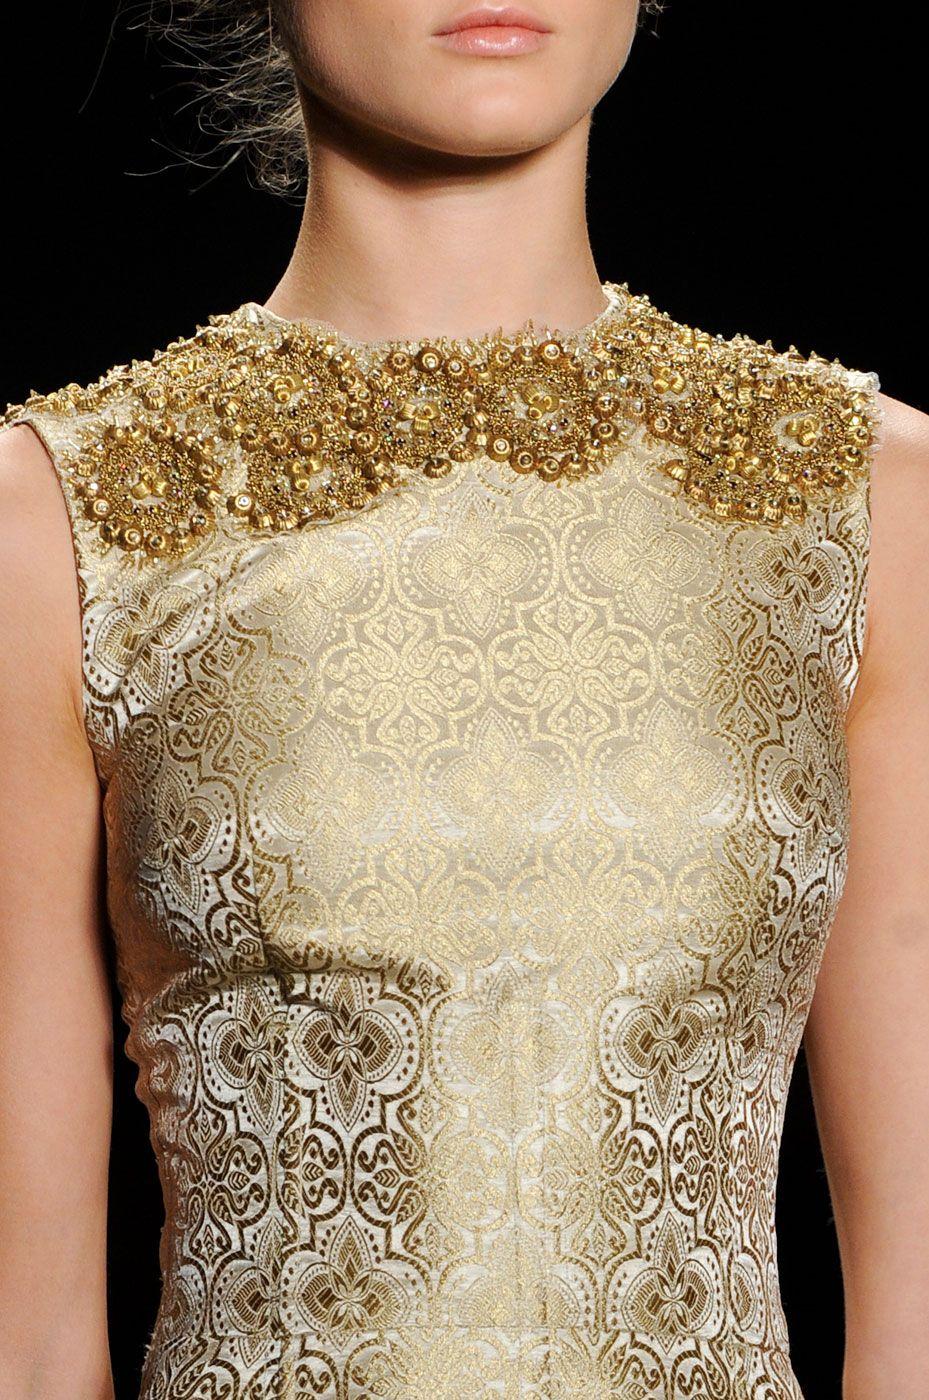 Vera Wang Details S/S '13 #Baroque #Print #Pattern